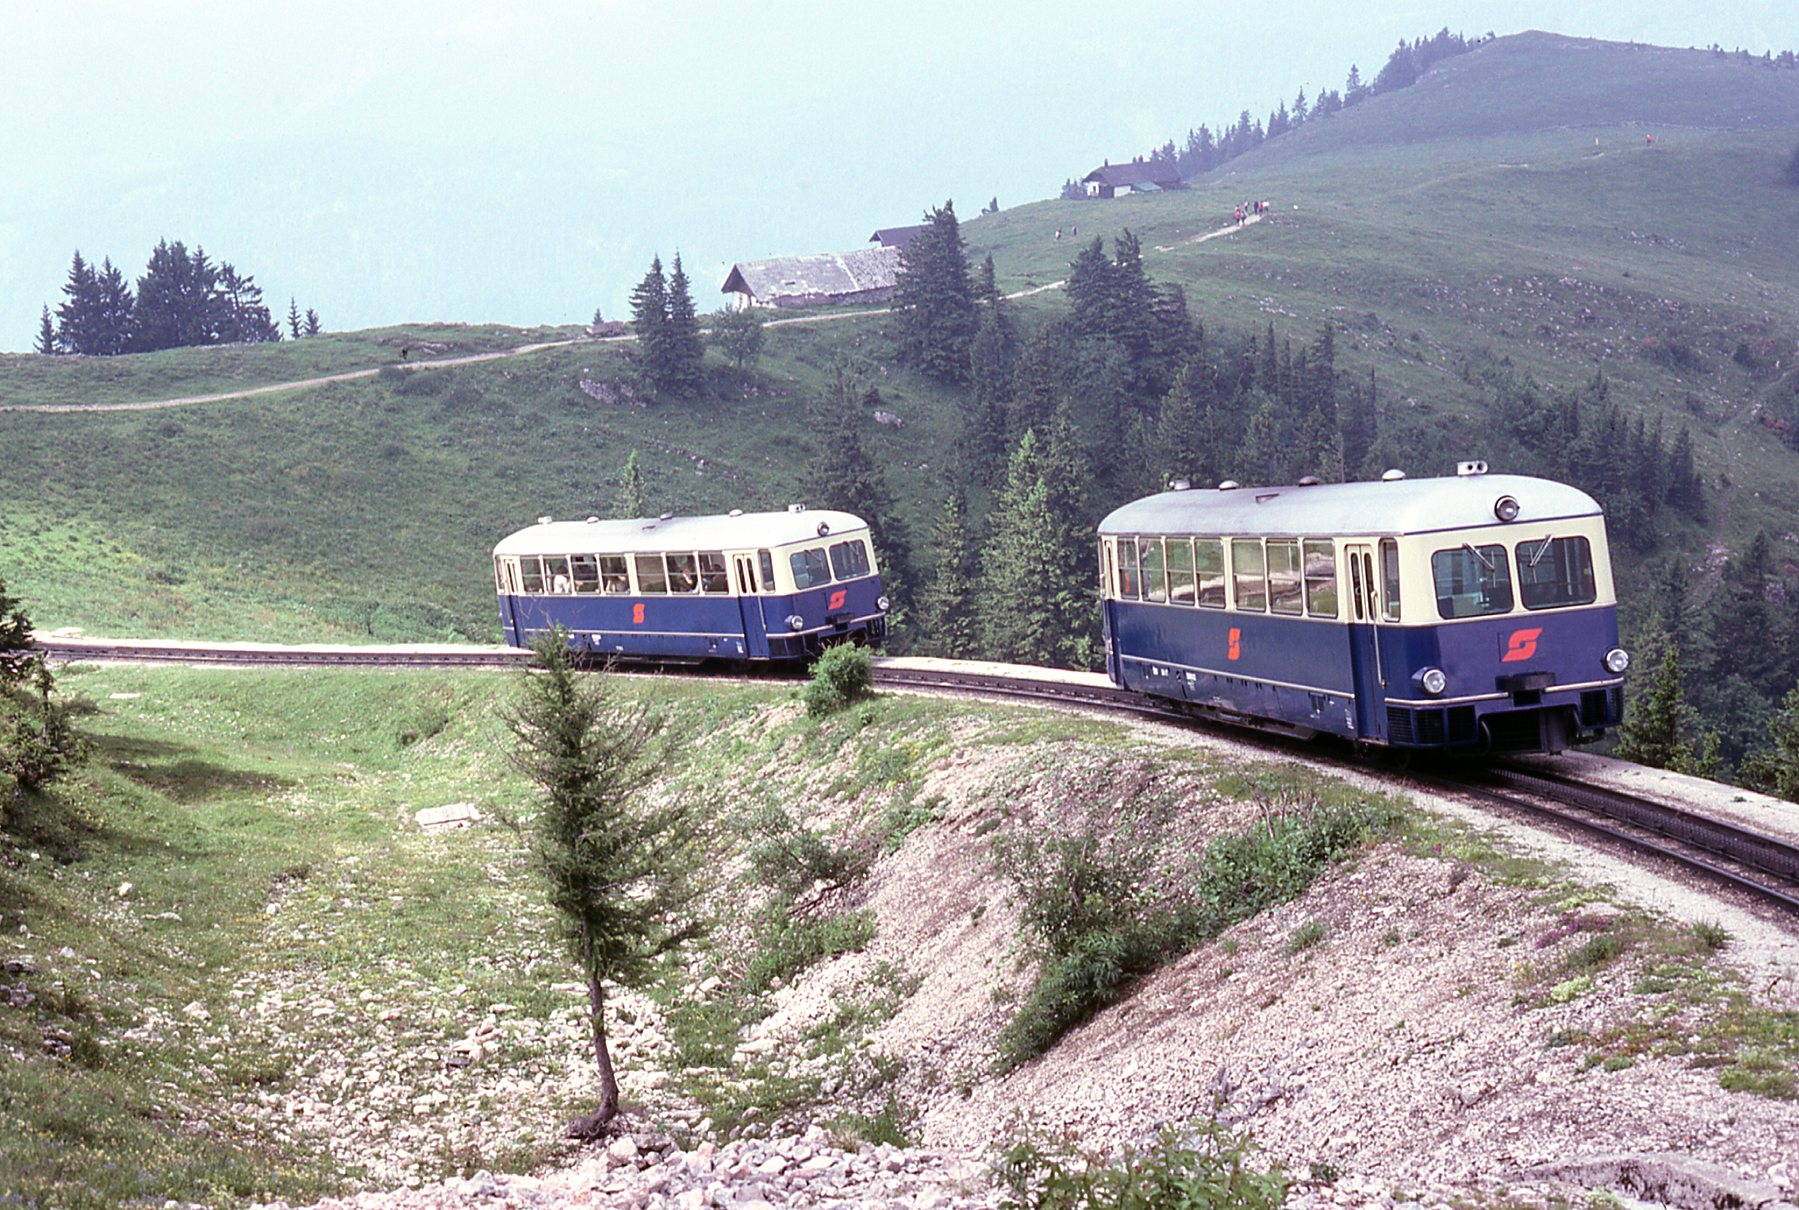 File:Schafbergbahn 5099 railcars at Schafbergalpe.jpg